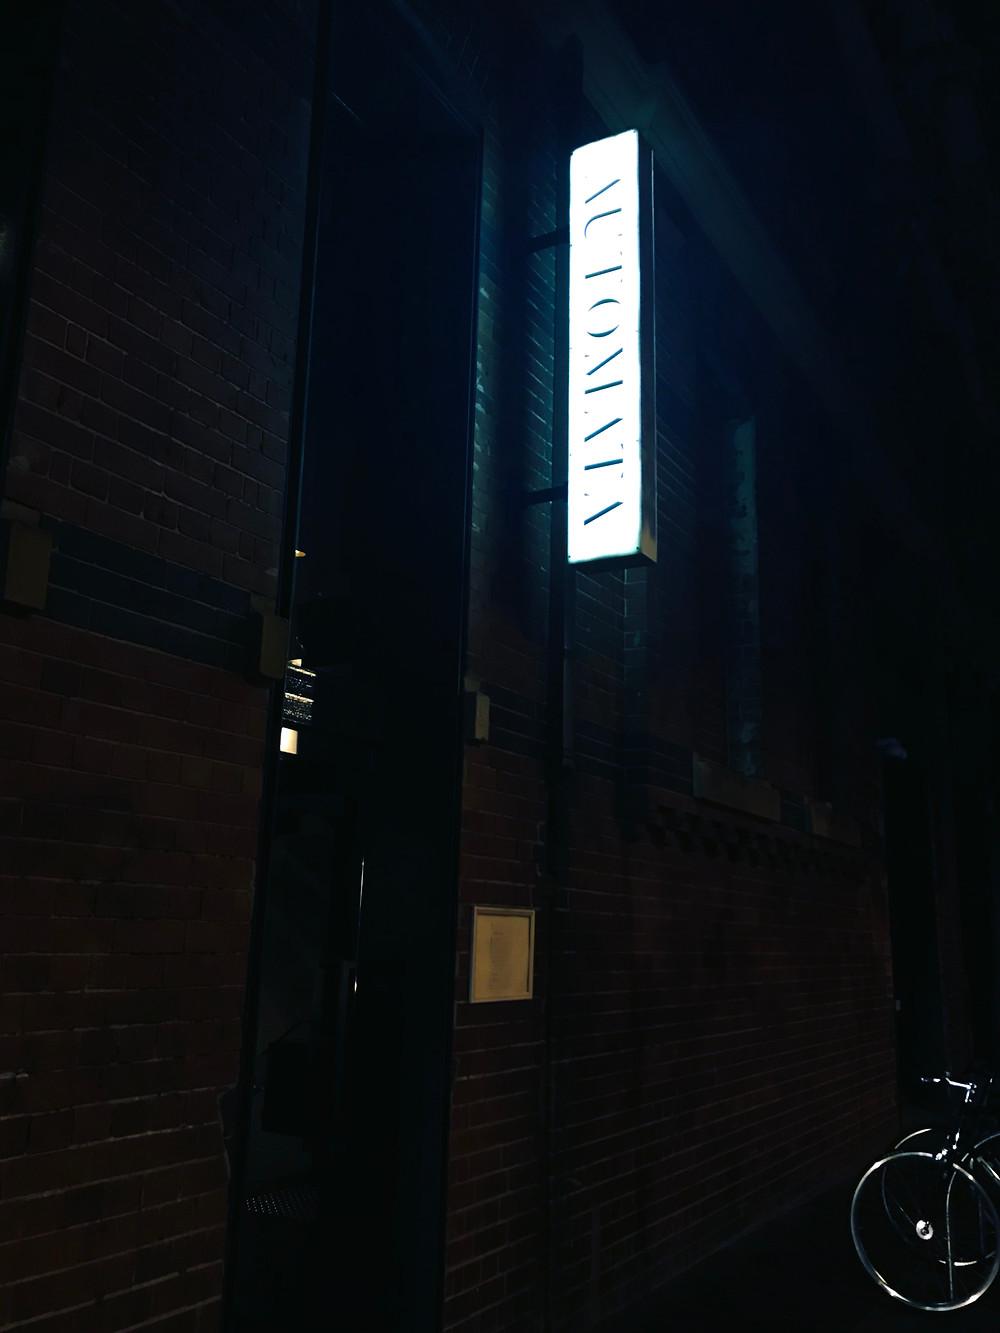 clovar-creative-automata-sydney-dining-review-chippendale-kensington-st